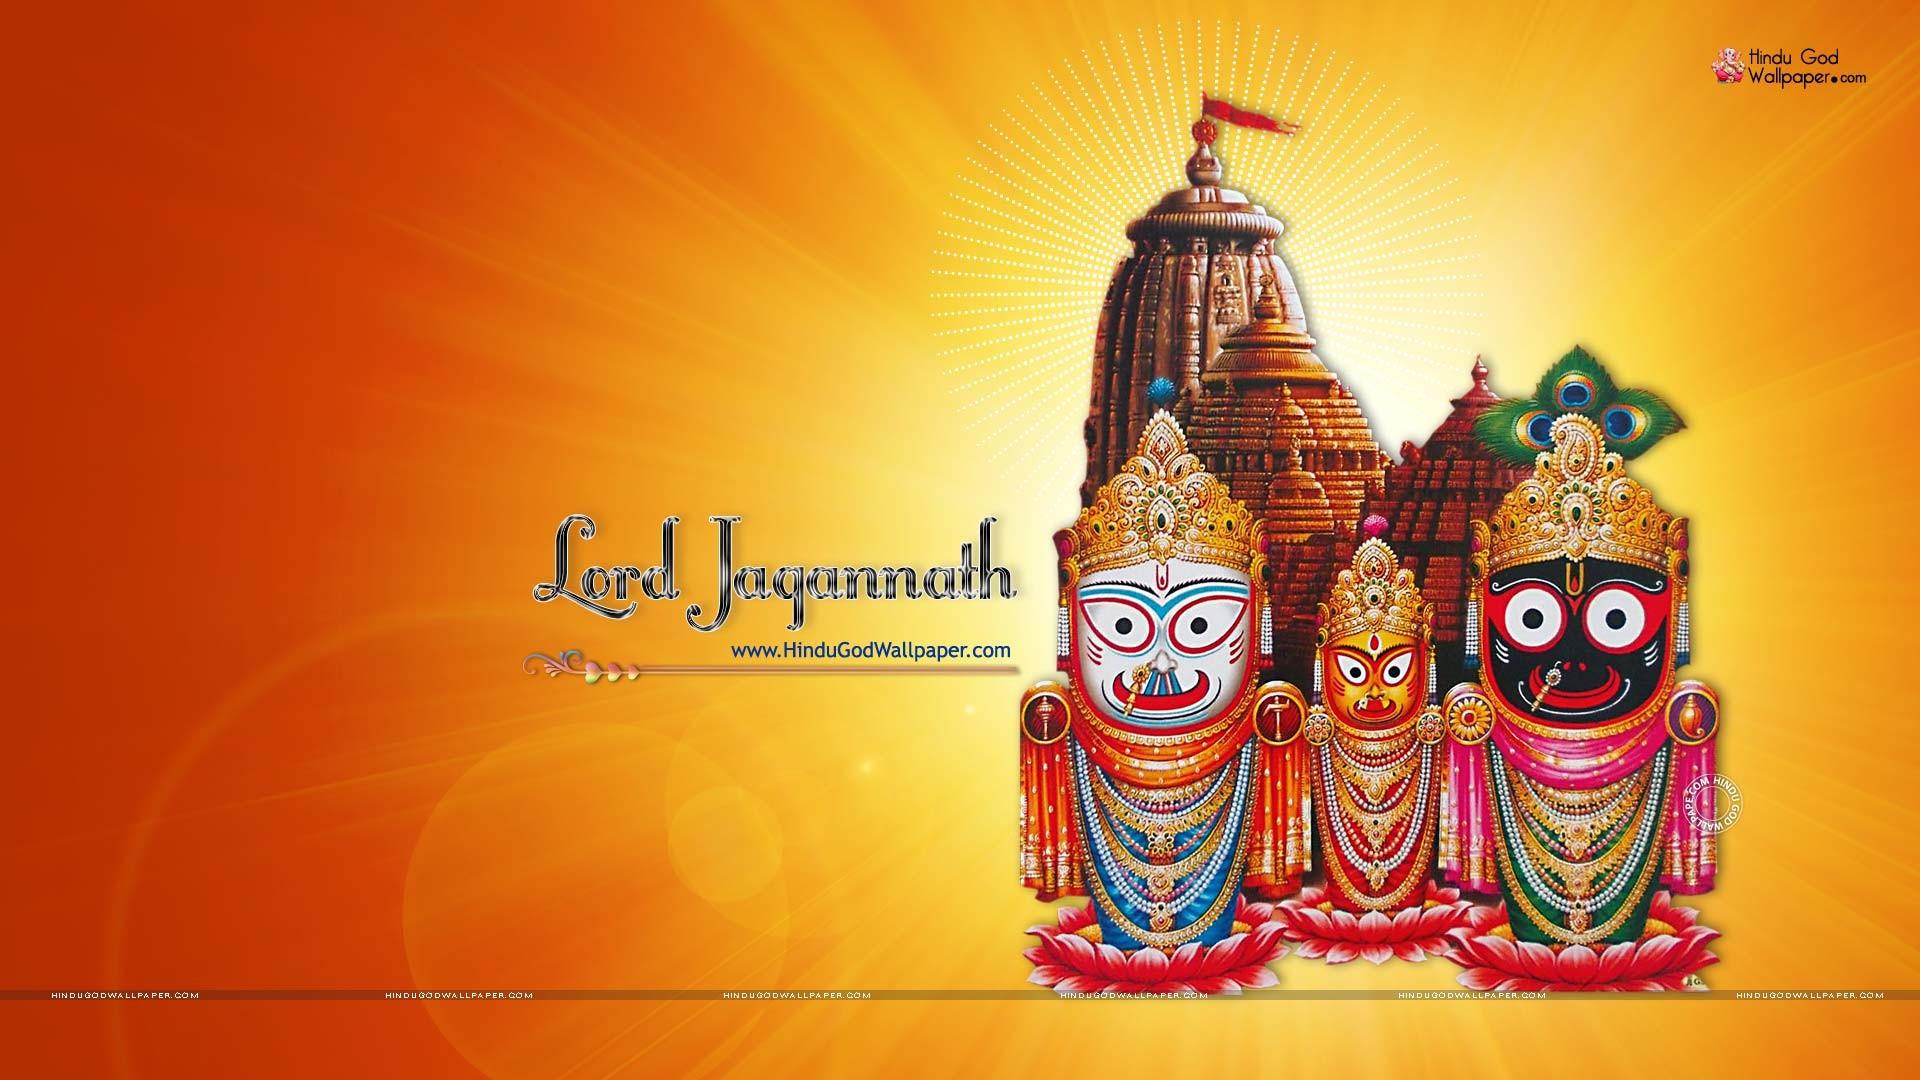 Hindu God HD Wallpapers 1080p (68+ Images